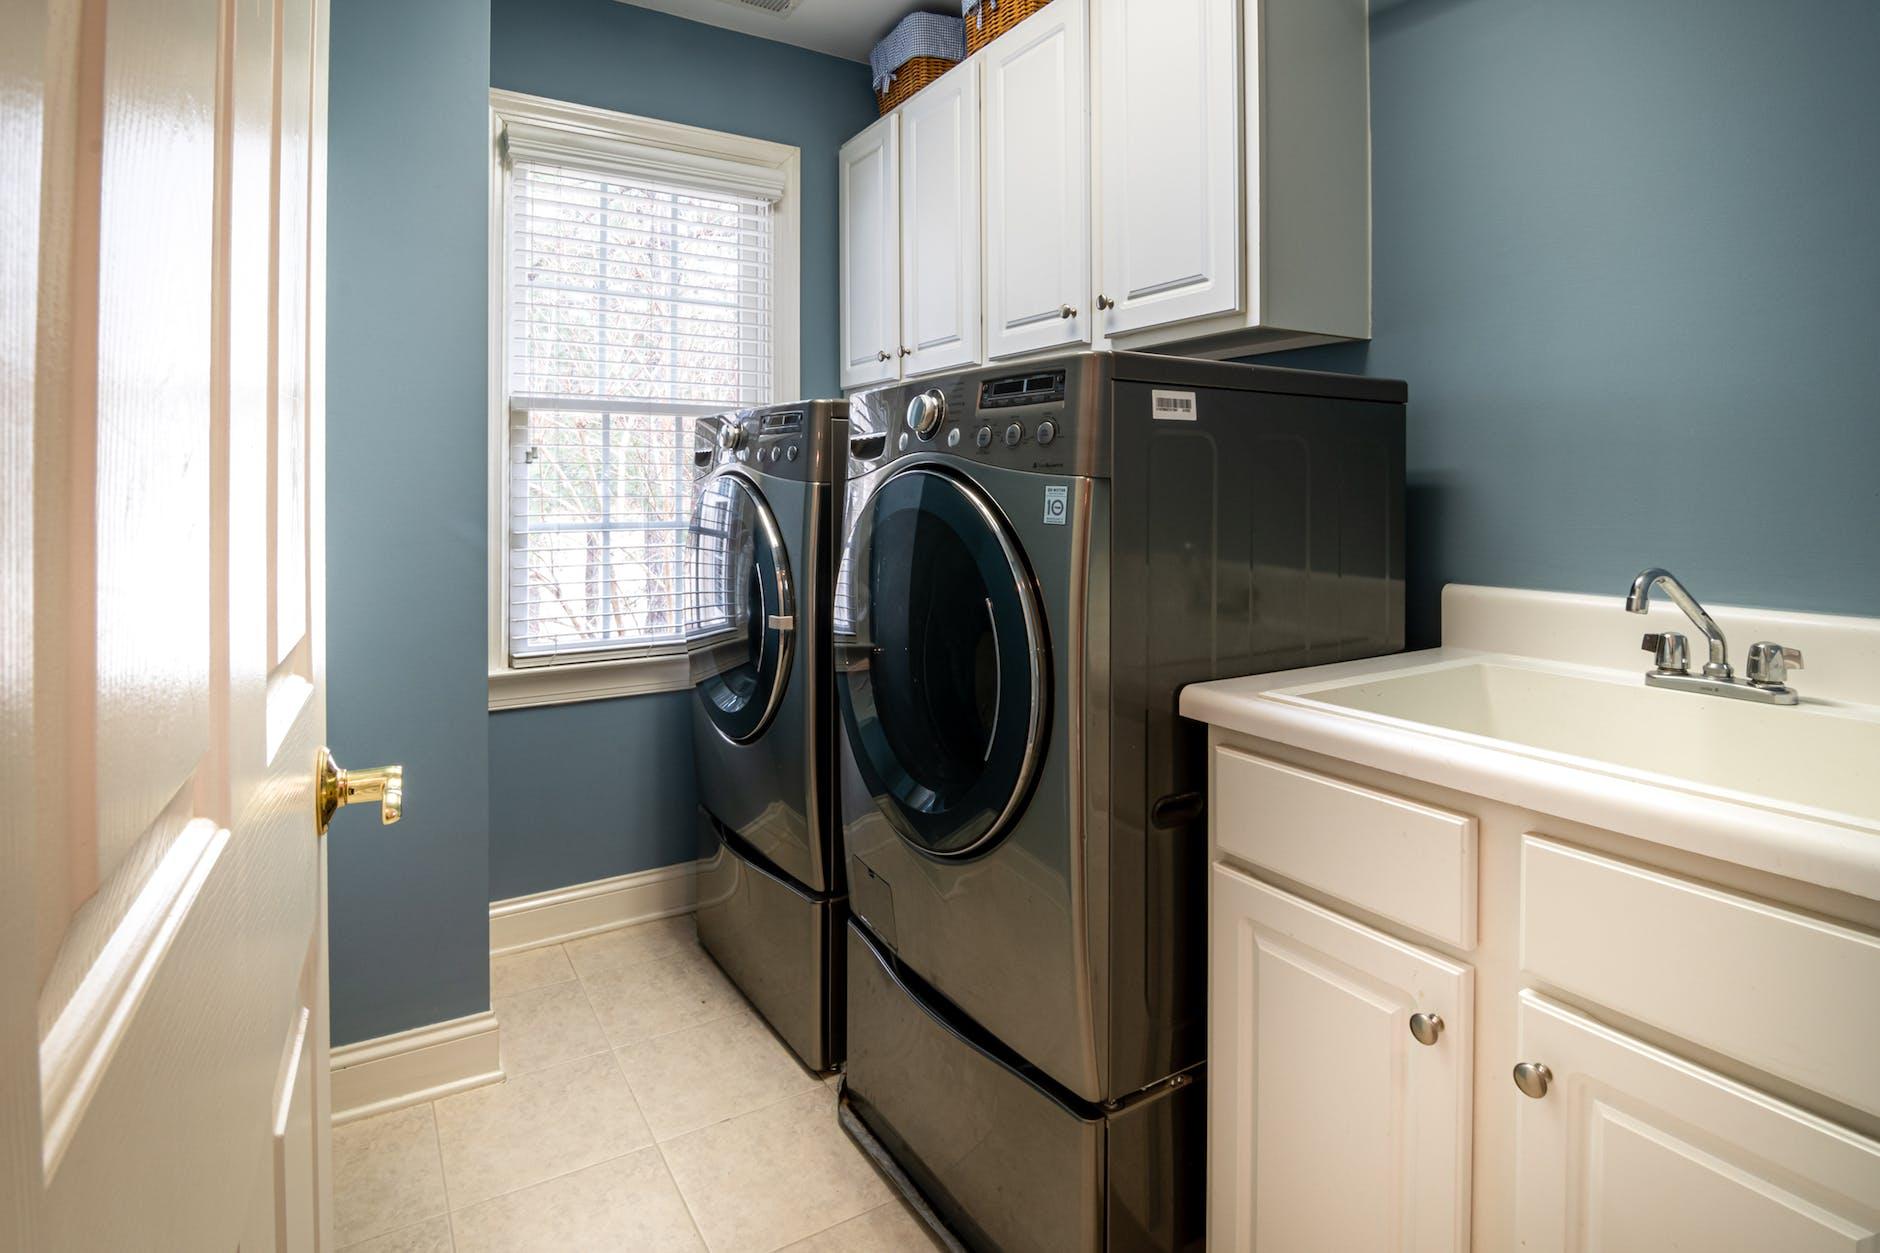 does a washing machine kill bedbugs?